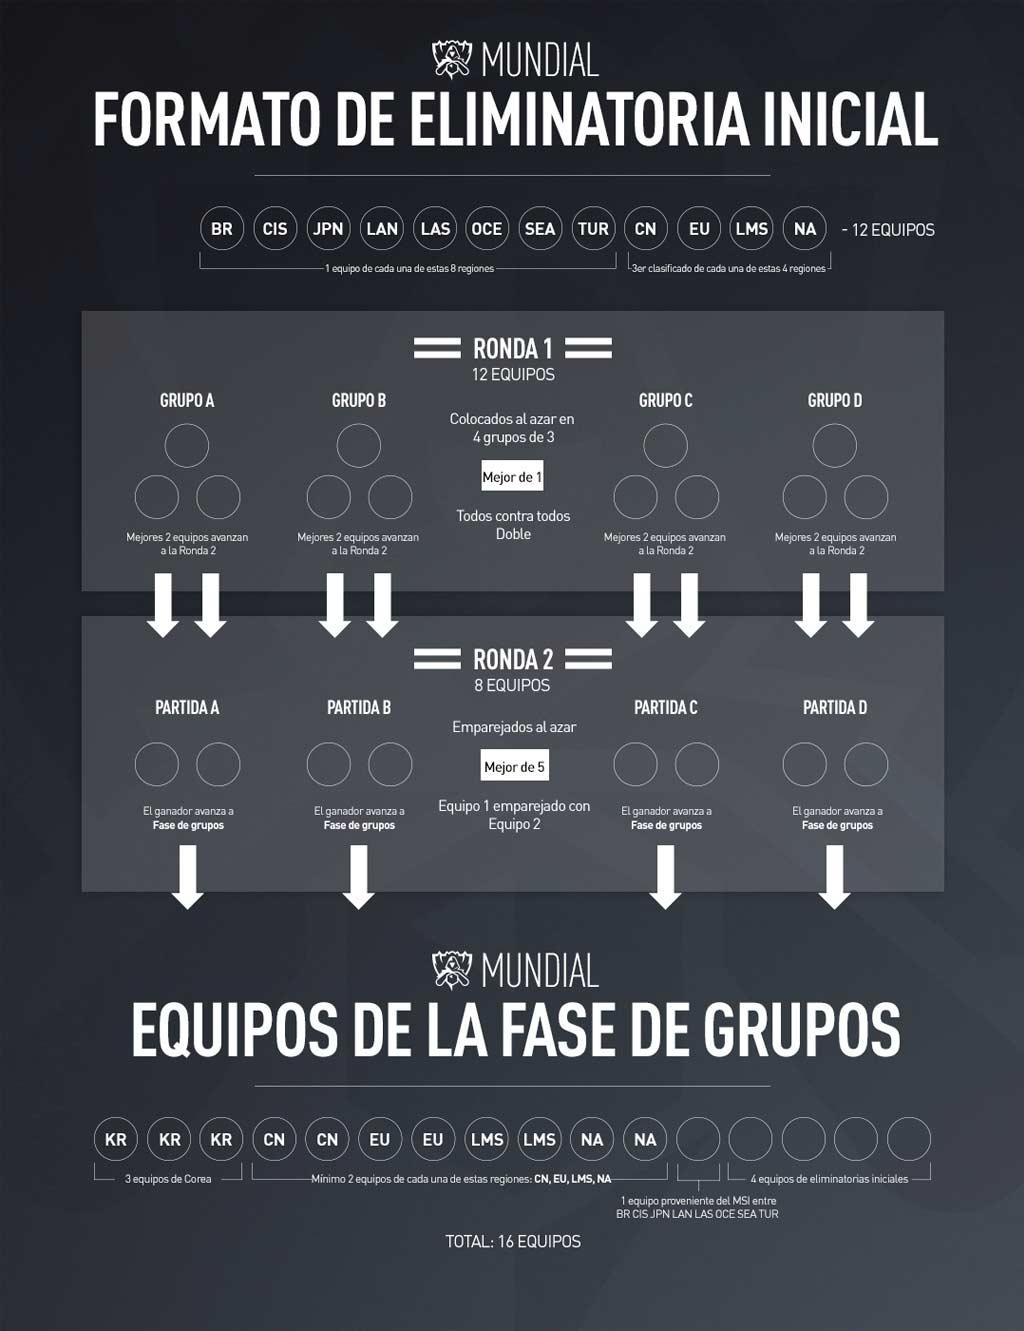 Formato de eliminatoria inicial del Campeonato Mundial de League of Legends 2017